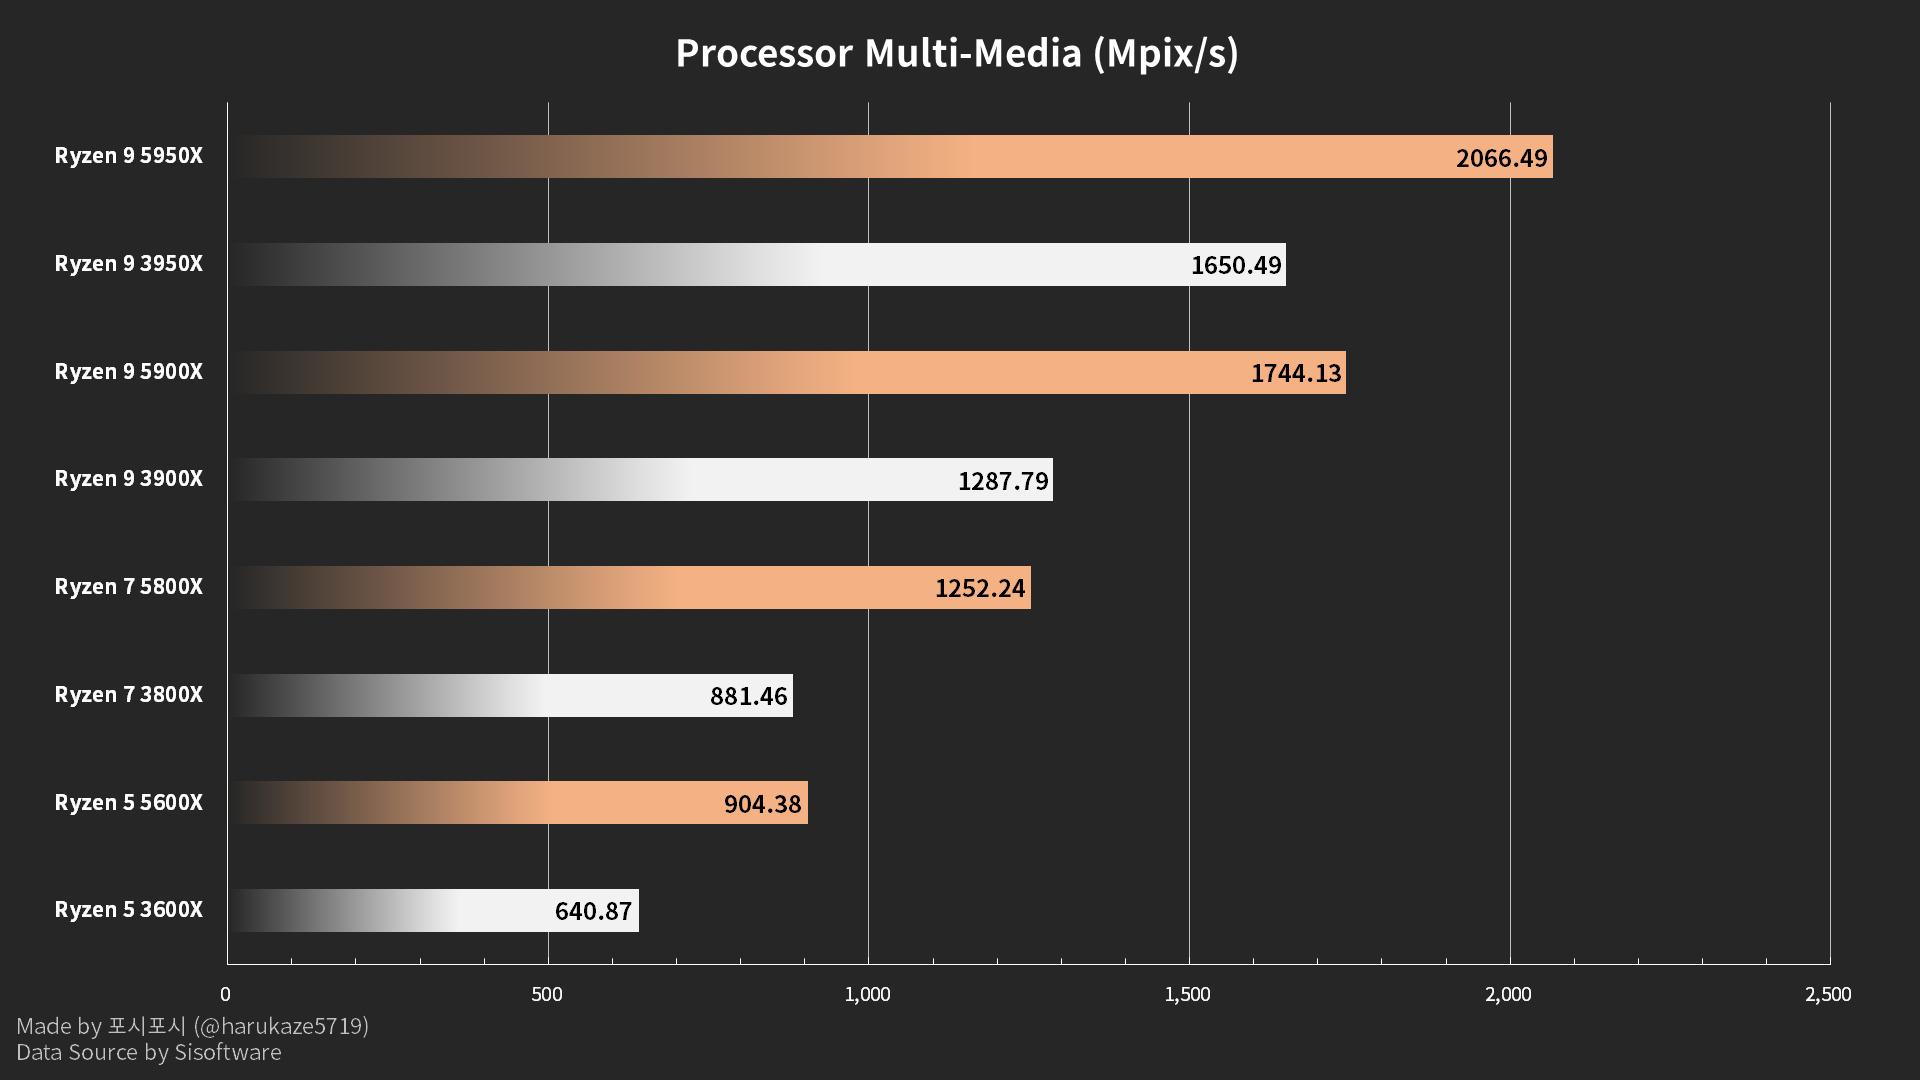 Processor Multi-Media (Mpix/s)